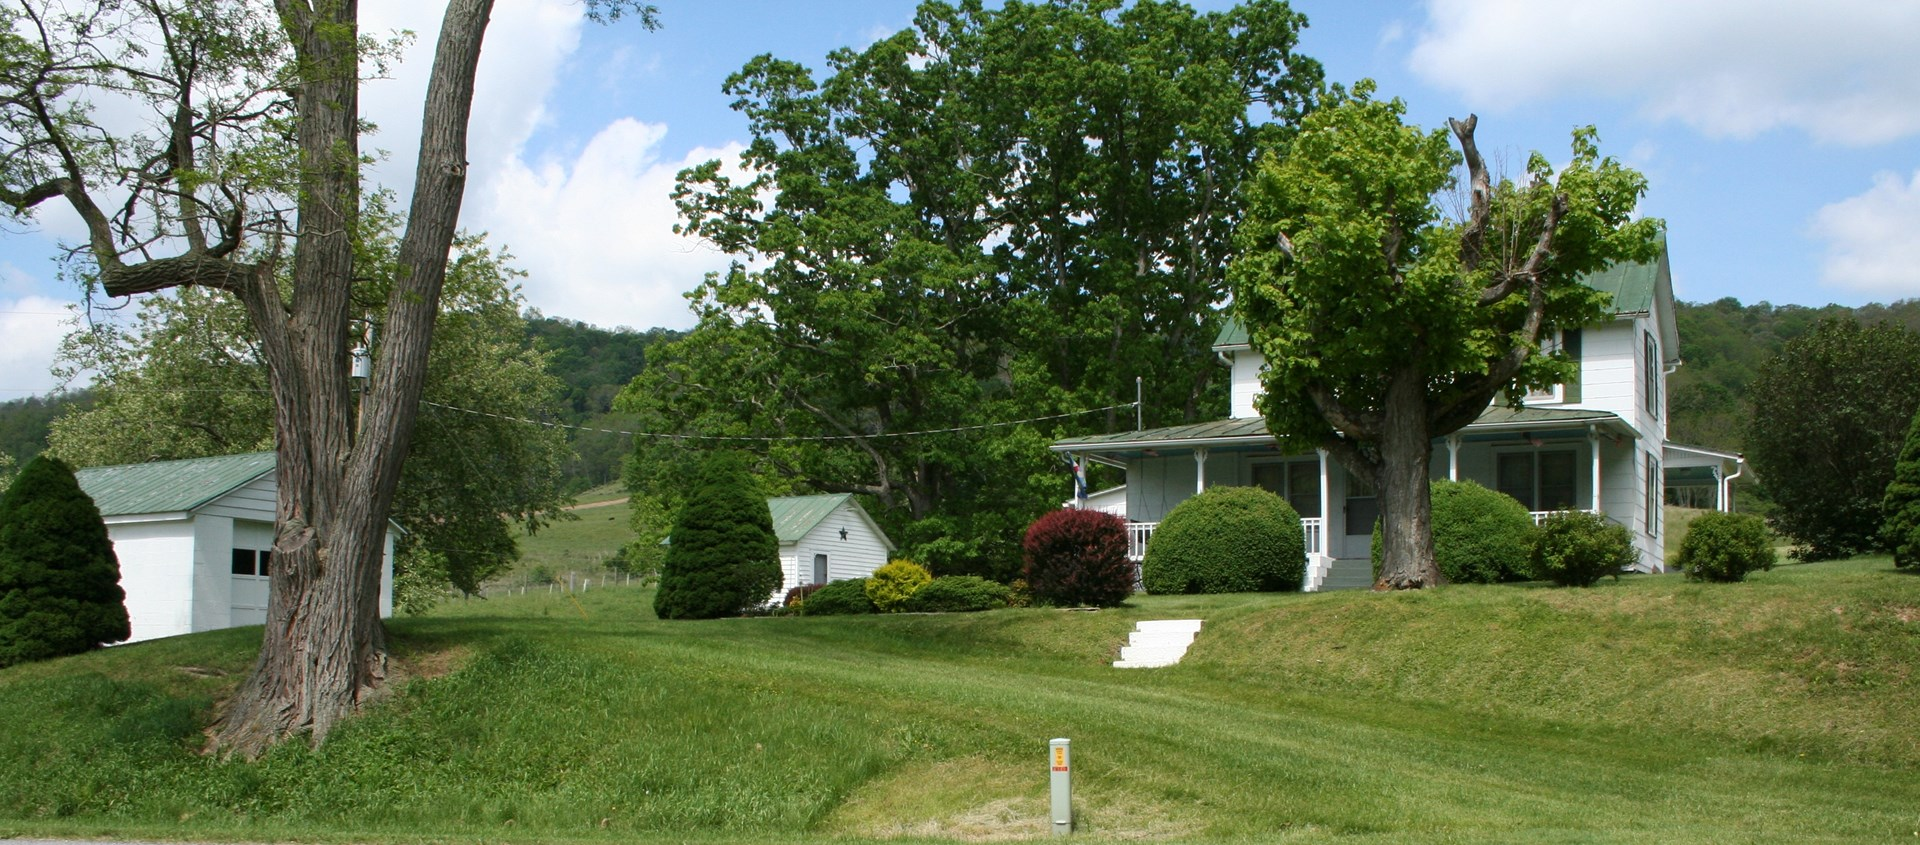 Farm House w/5 outbuildings on 11 acres in Highland Co. VA